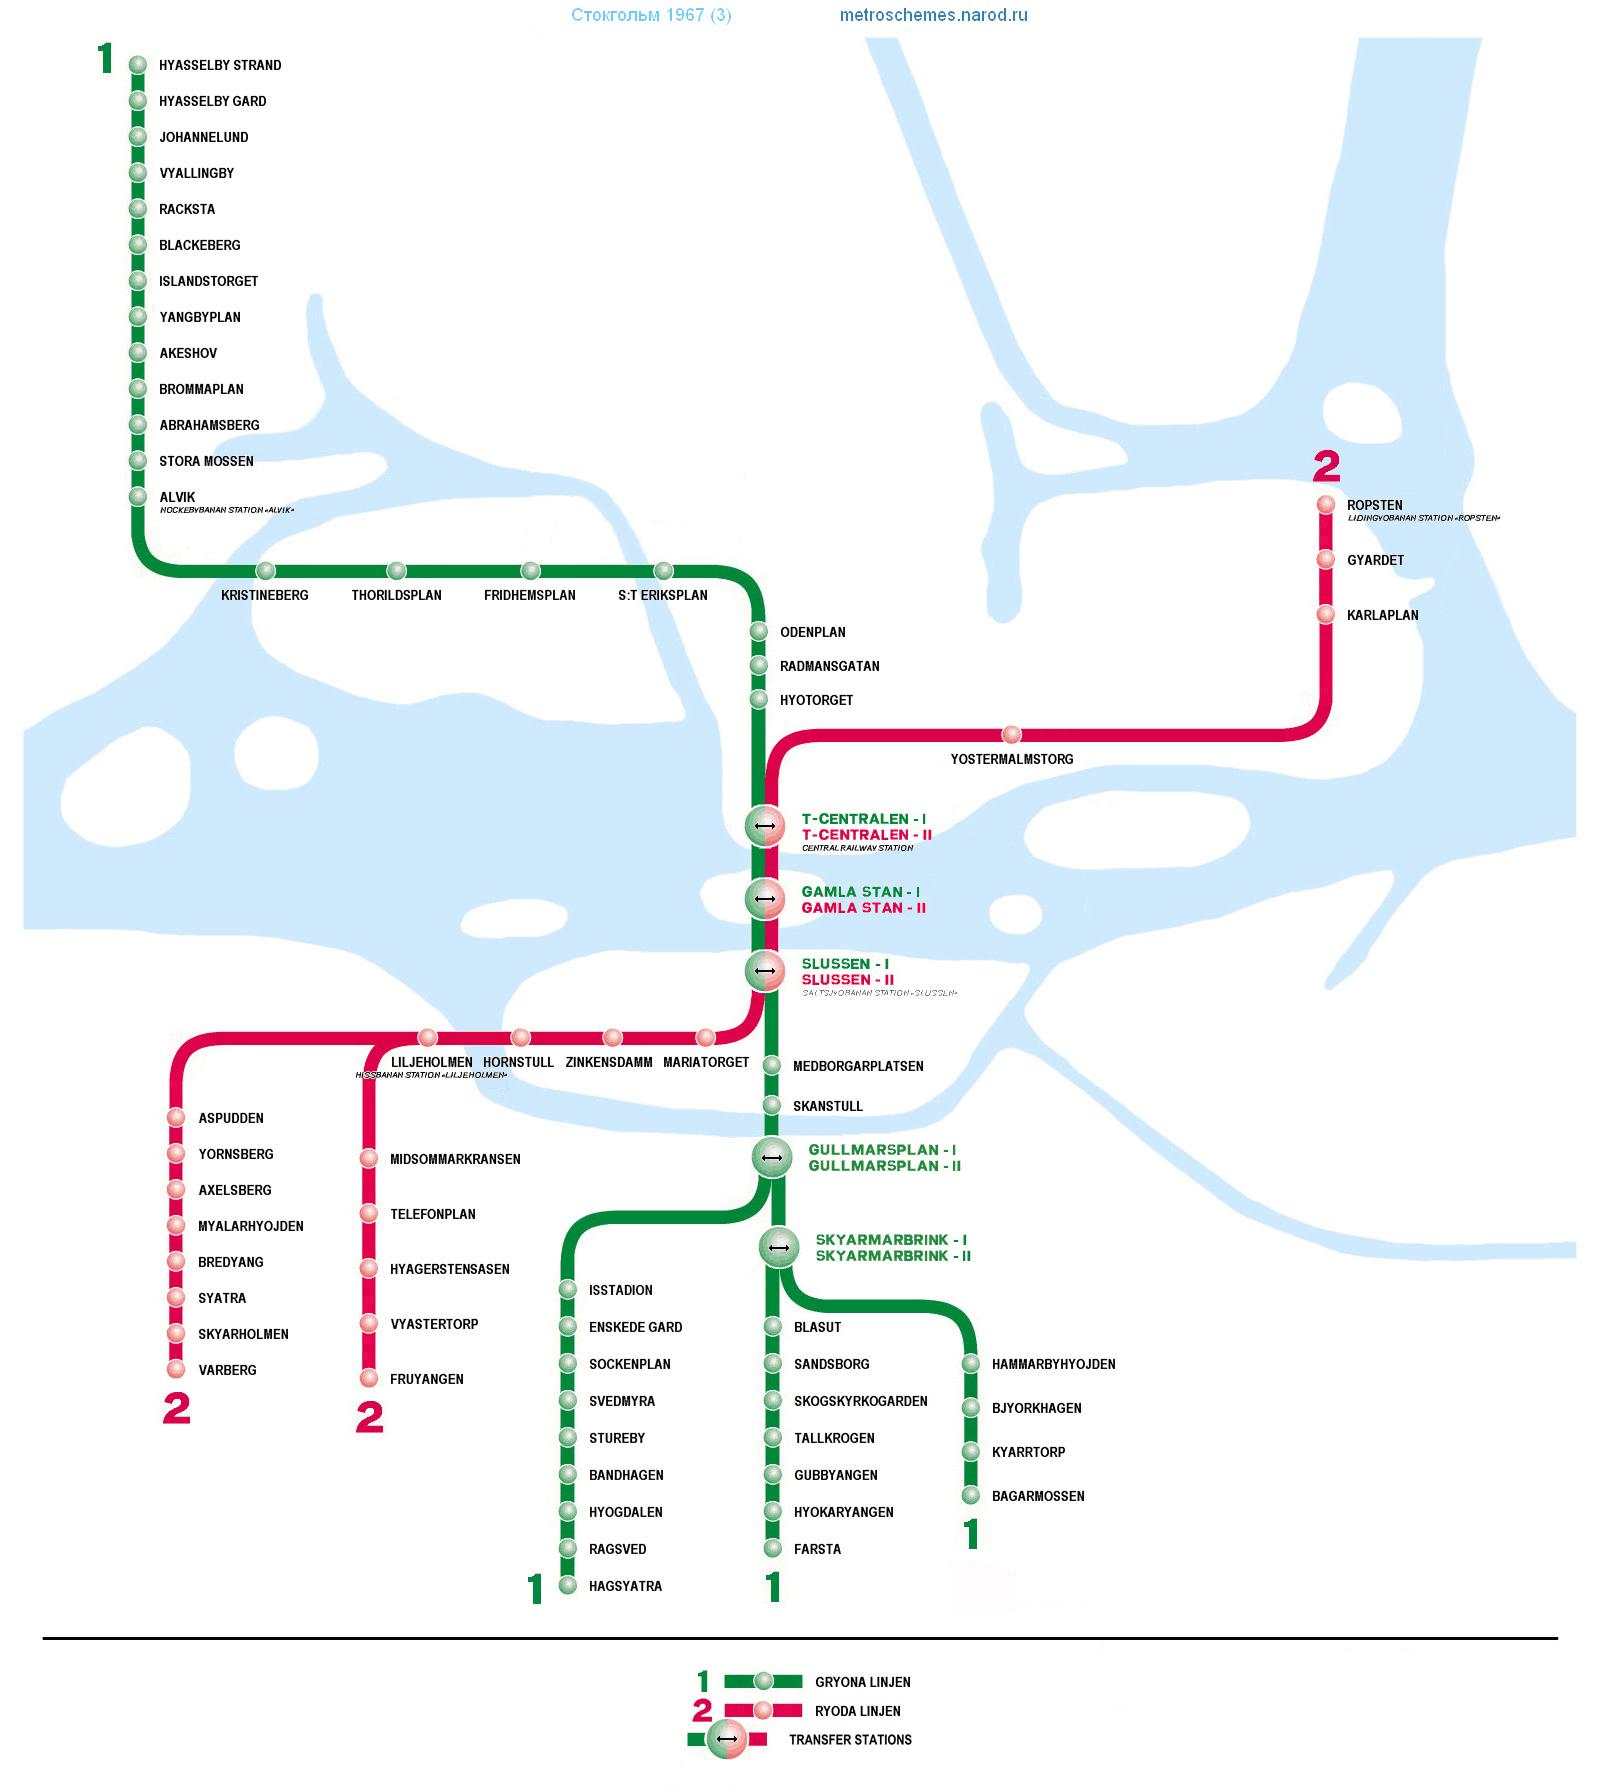 Схема метро стокгольма на русском